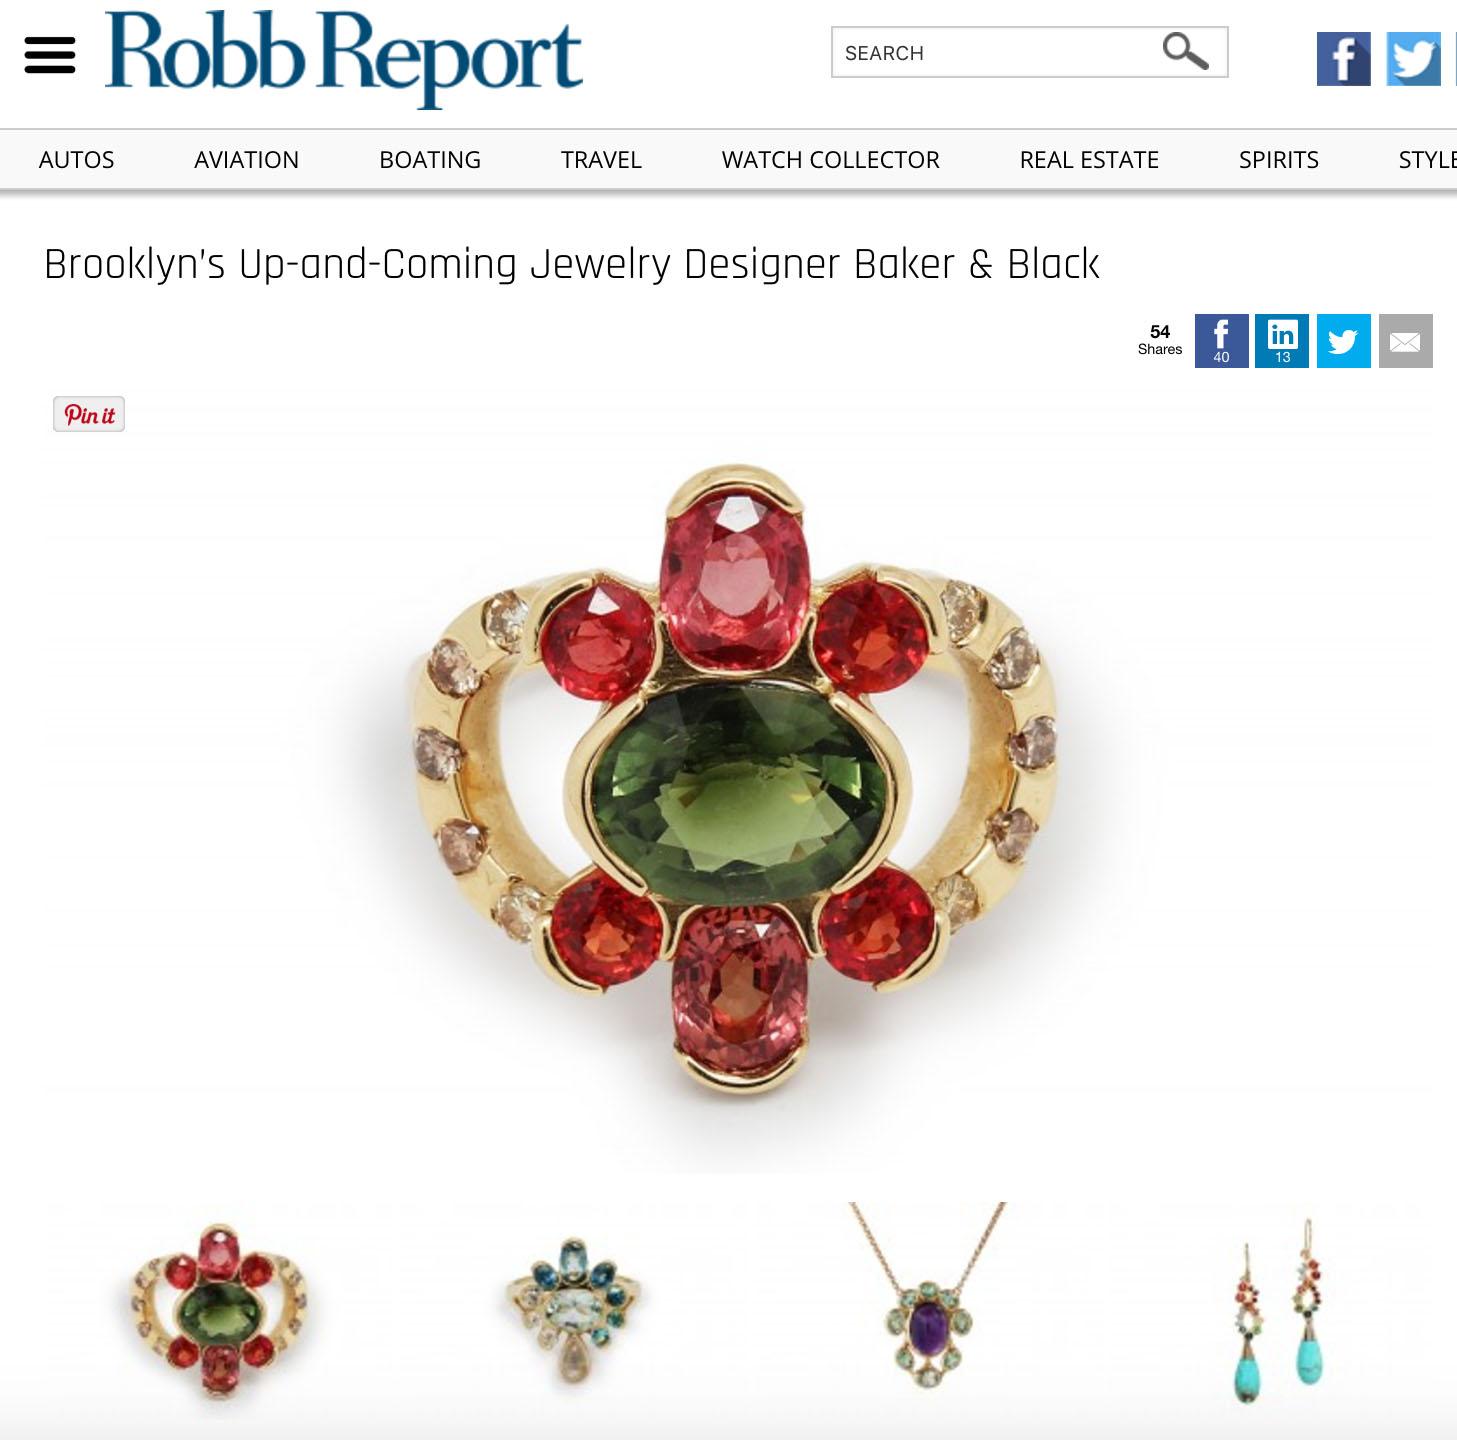 bb_robb_report.jpg